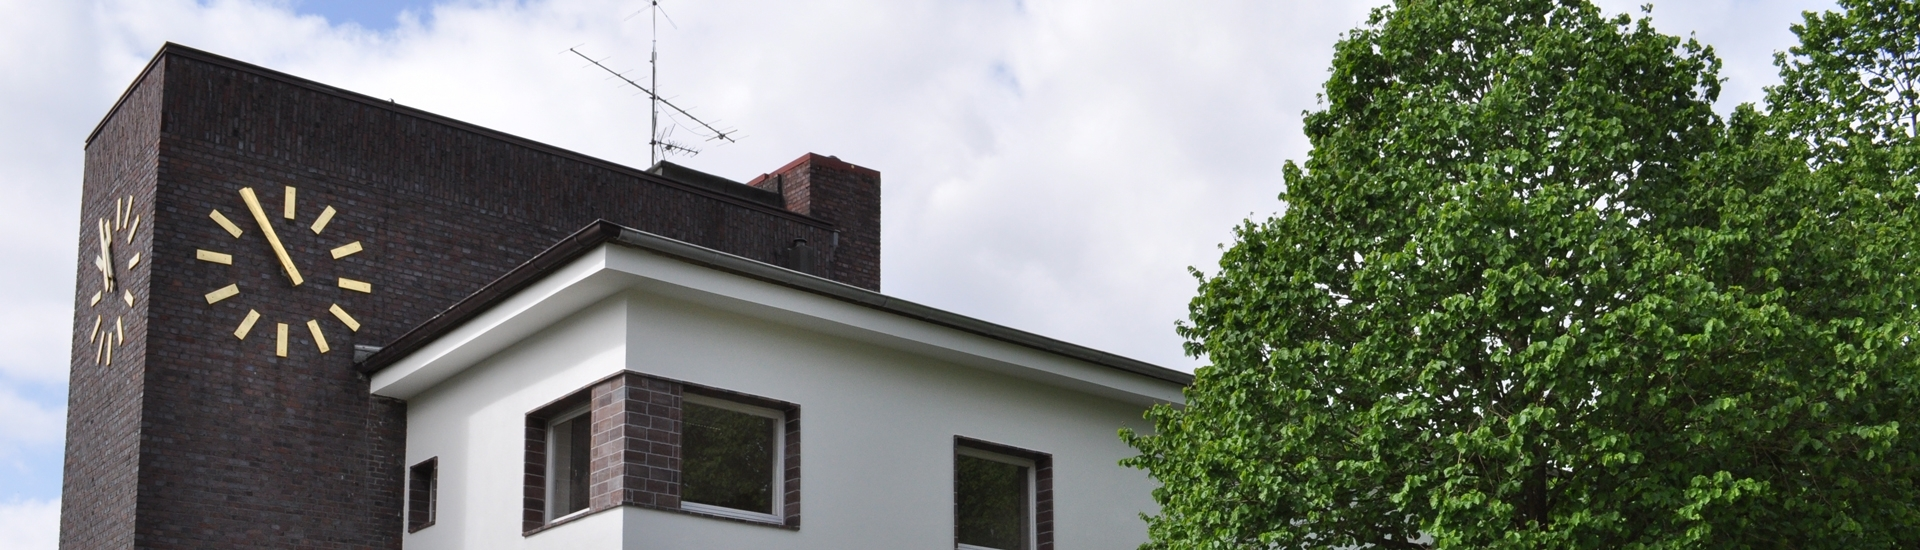 CDU-Ortsverband Jenfeld